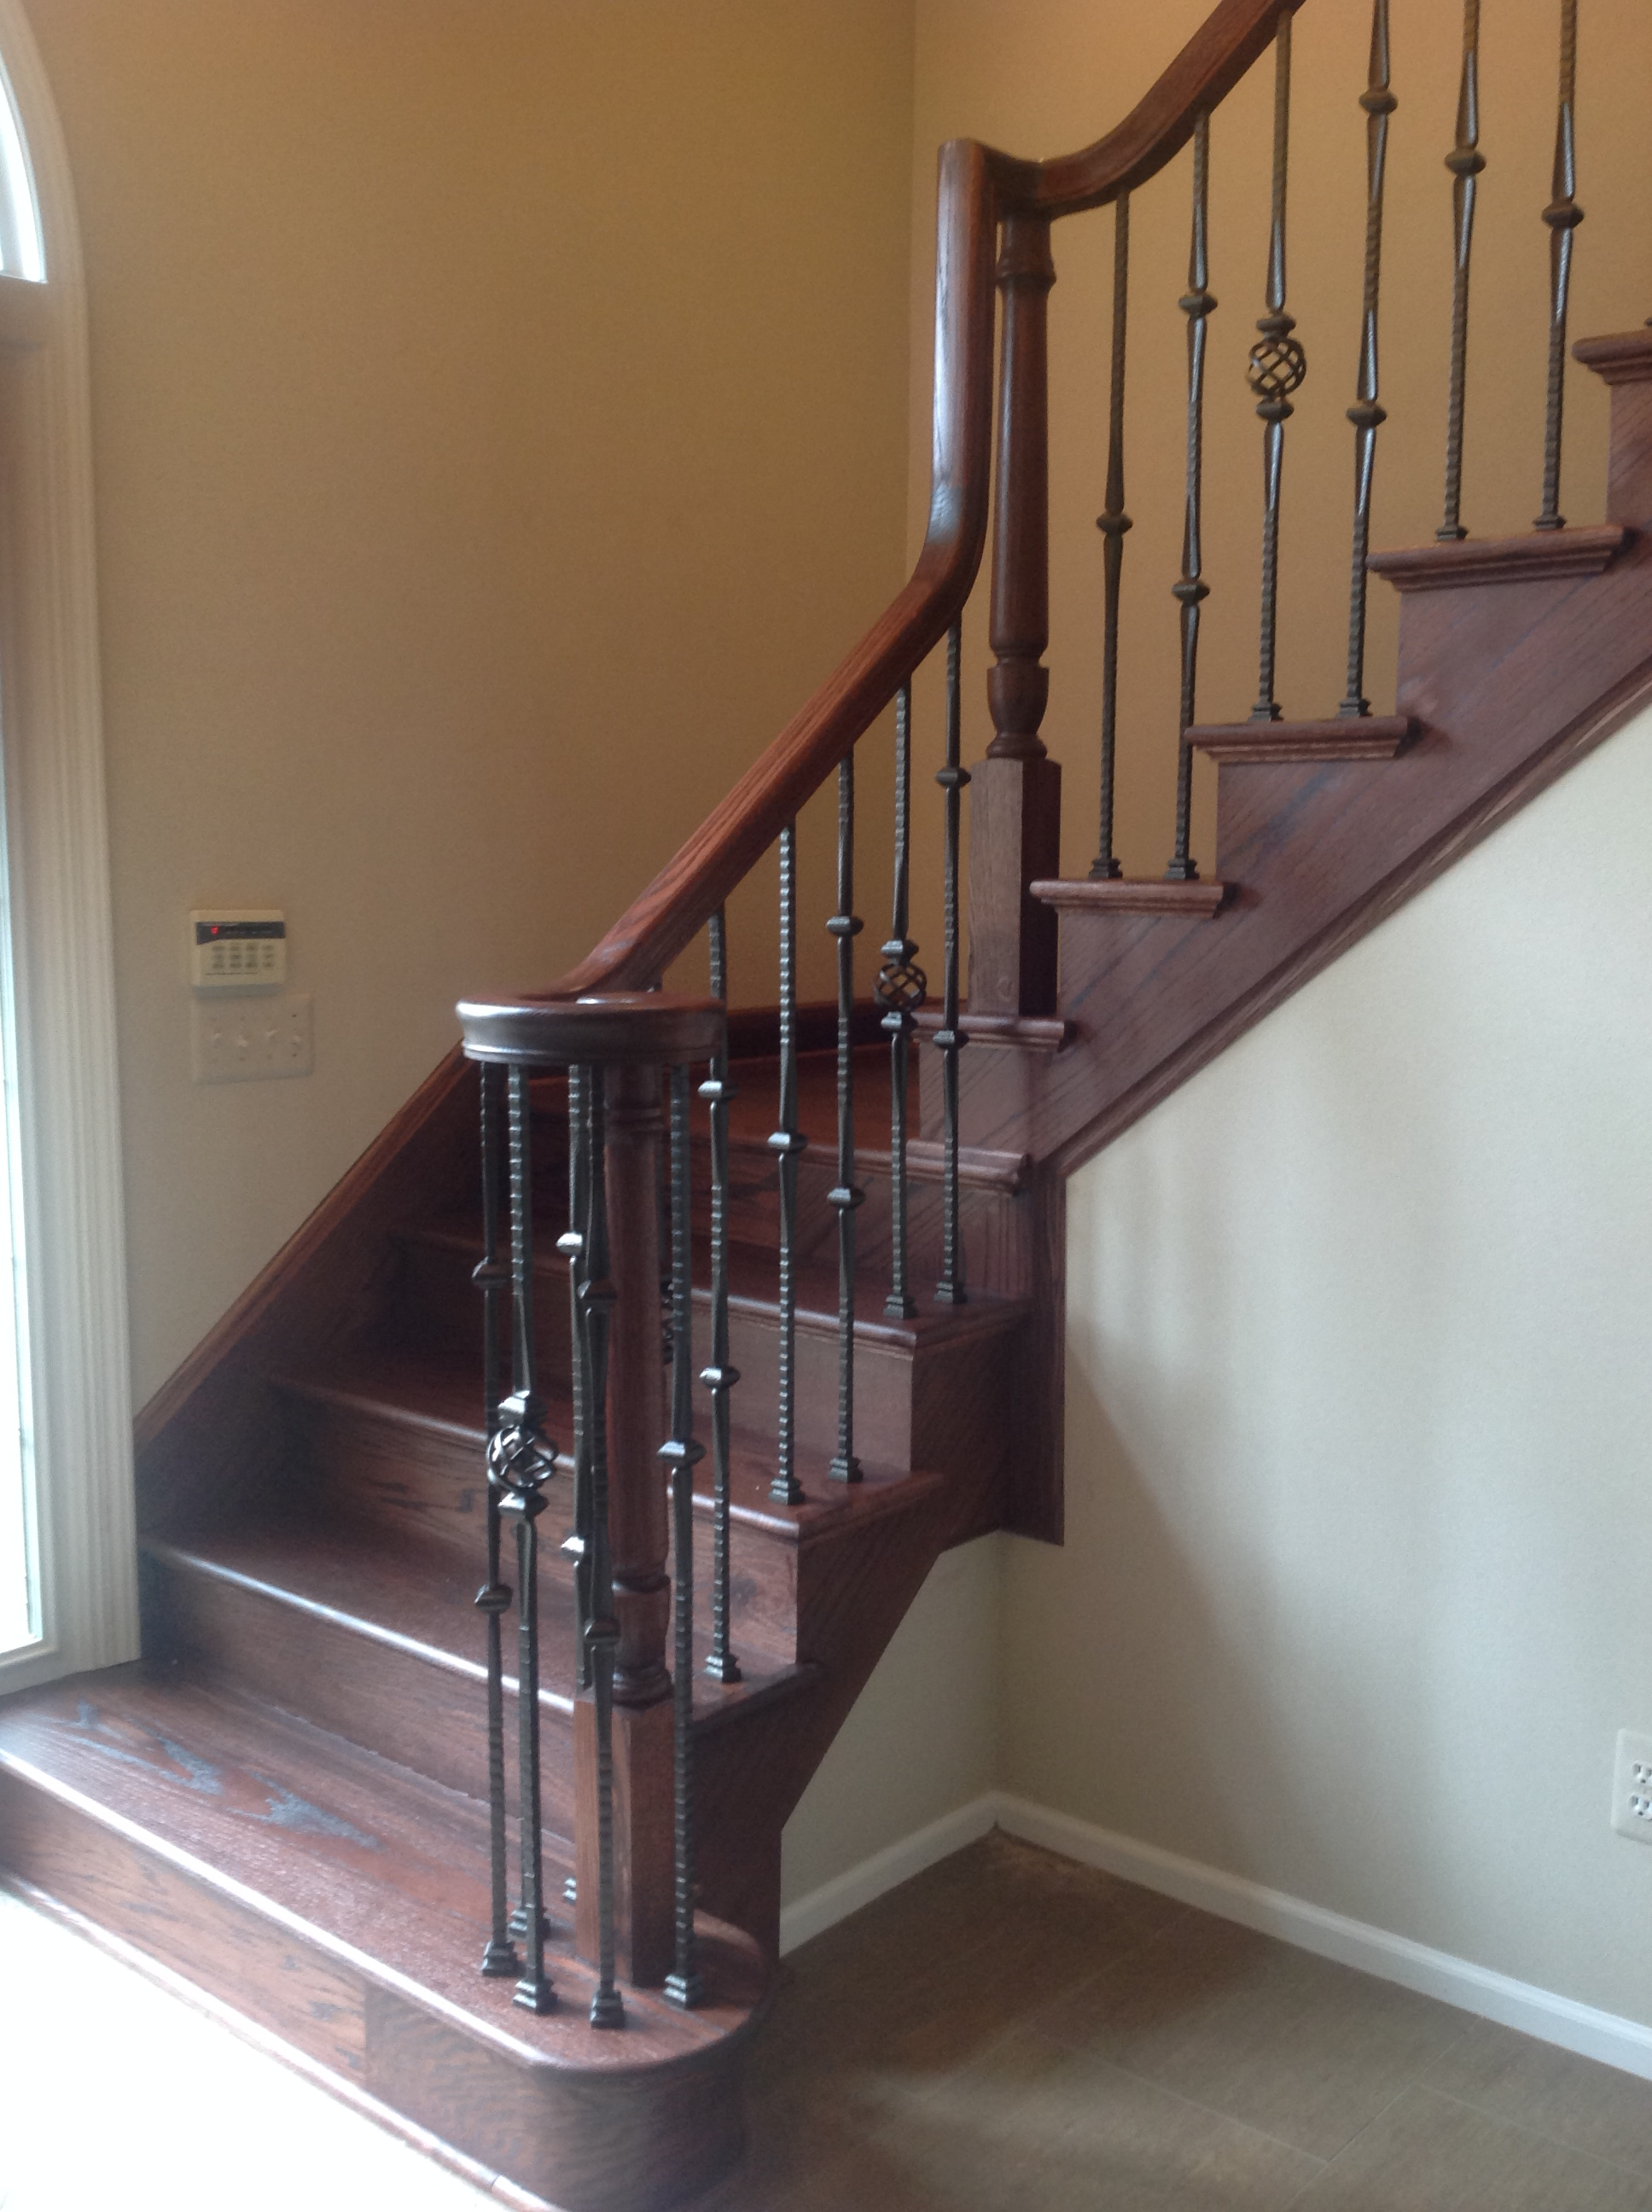 Stair pics 012.JPG